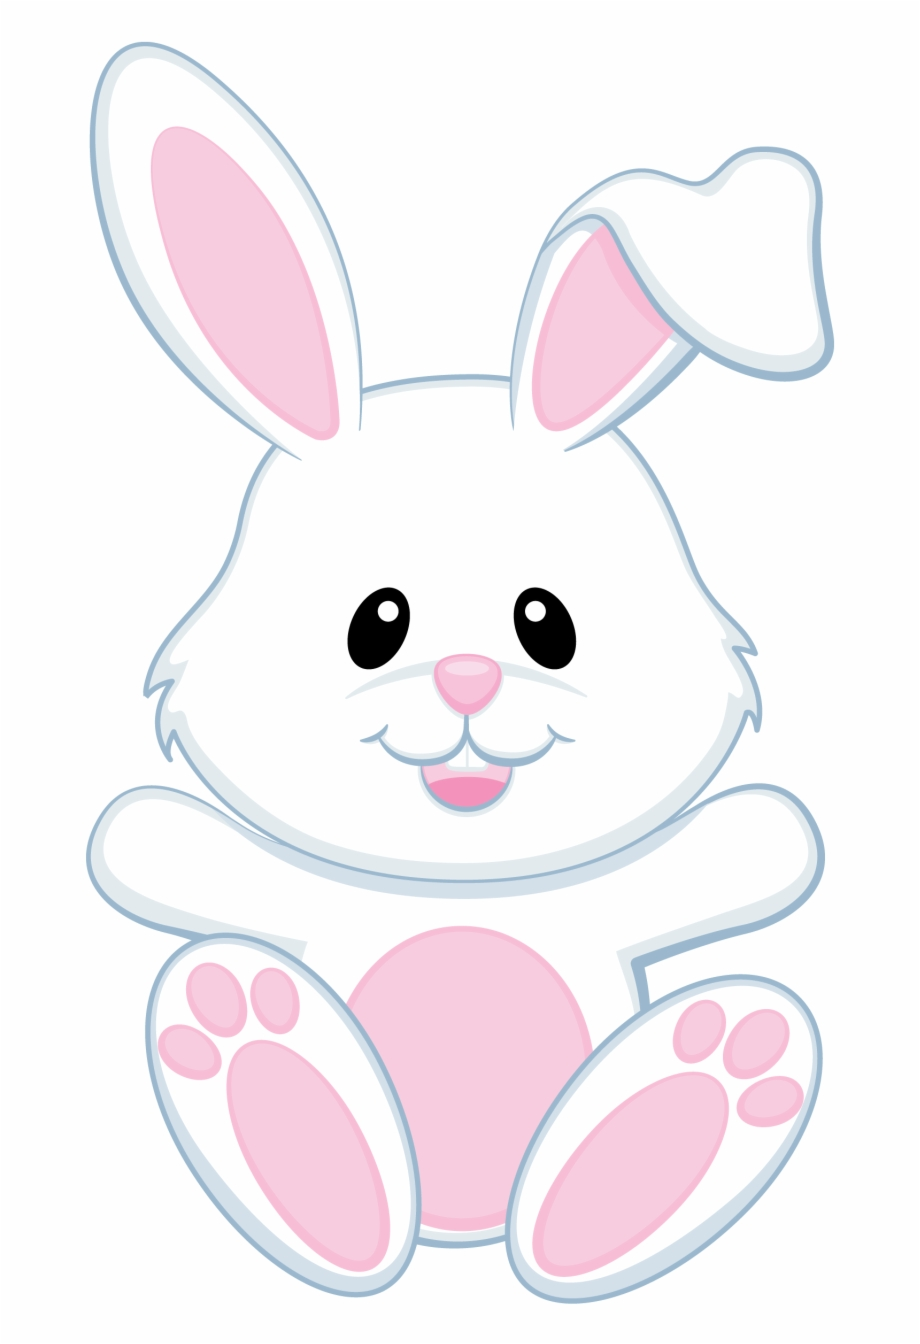 Bunnies modern easter . Clipart bunny transparent background